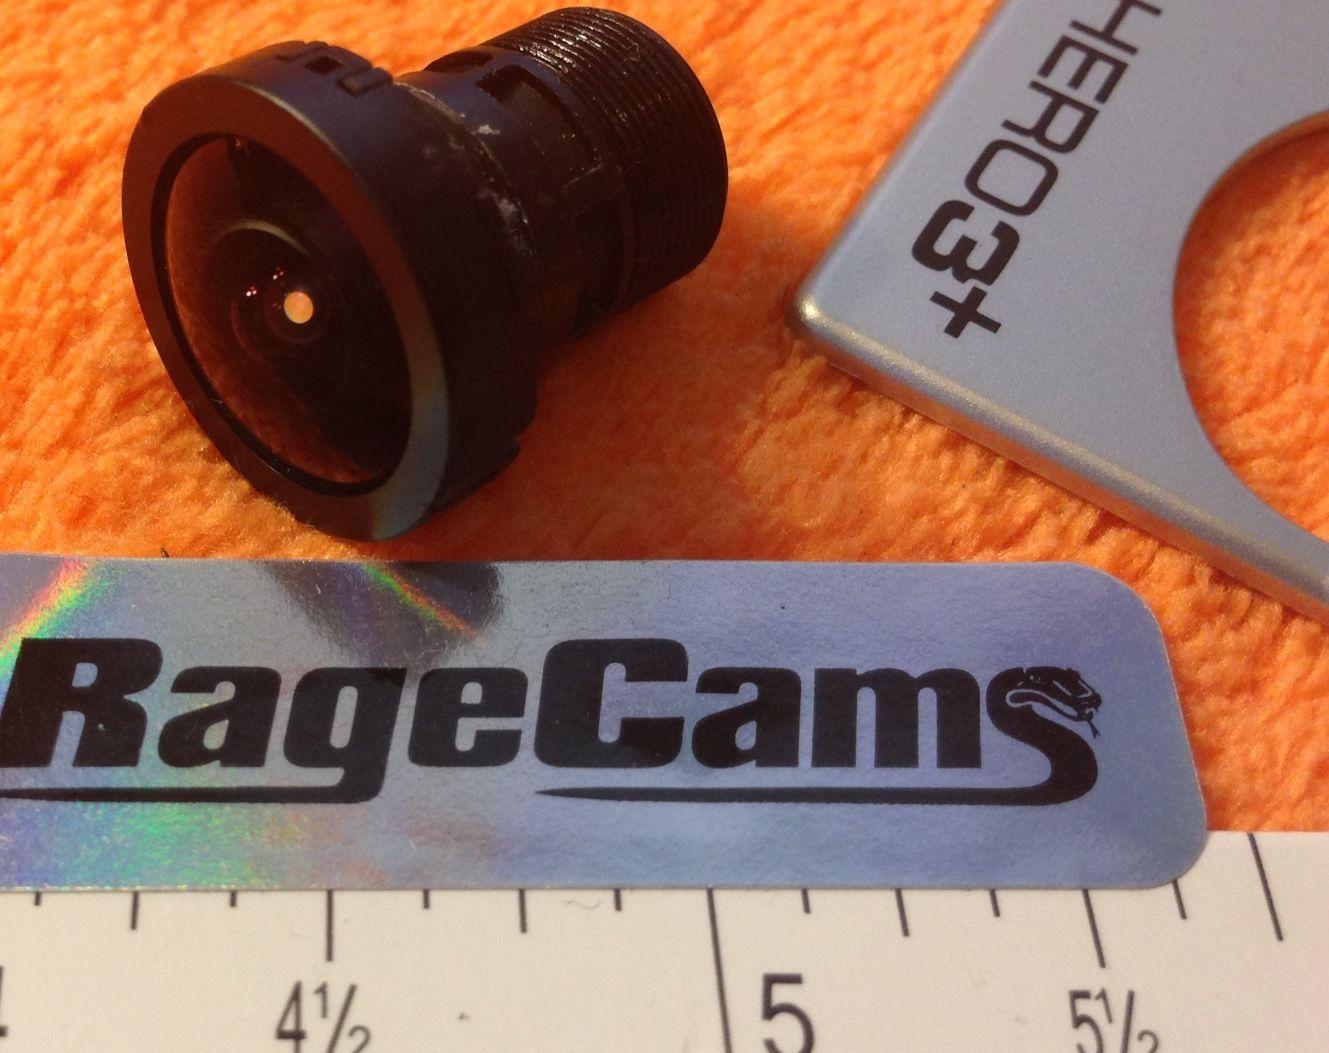 Tempat Jual Gopro Hero Acc Remote 20 Original Terbaru 2018 Austin Flats Millie Black Hitam 40 Hd Wearable Video Custom Mods By Ragecams Hero3 Superview